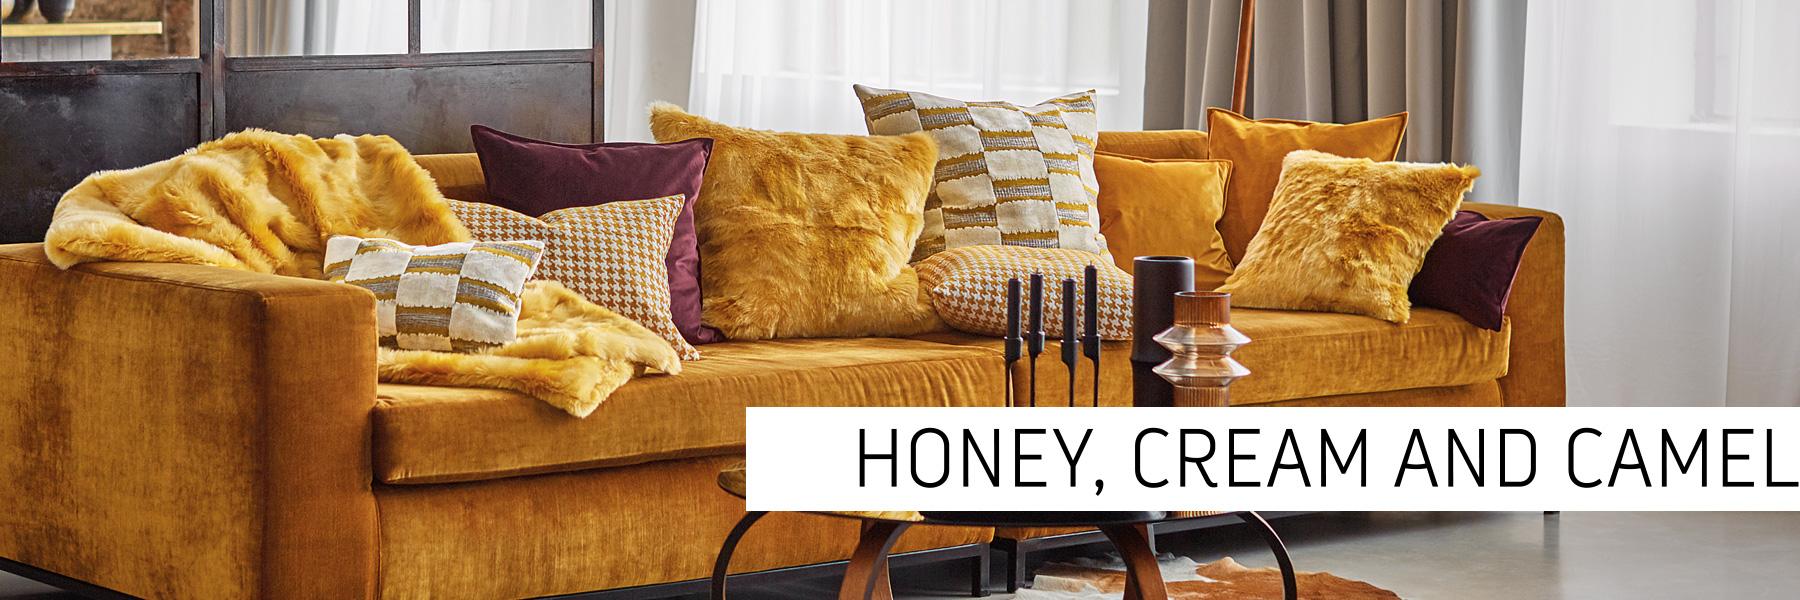 Proflax Honey cream and camel